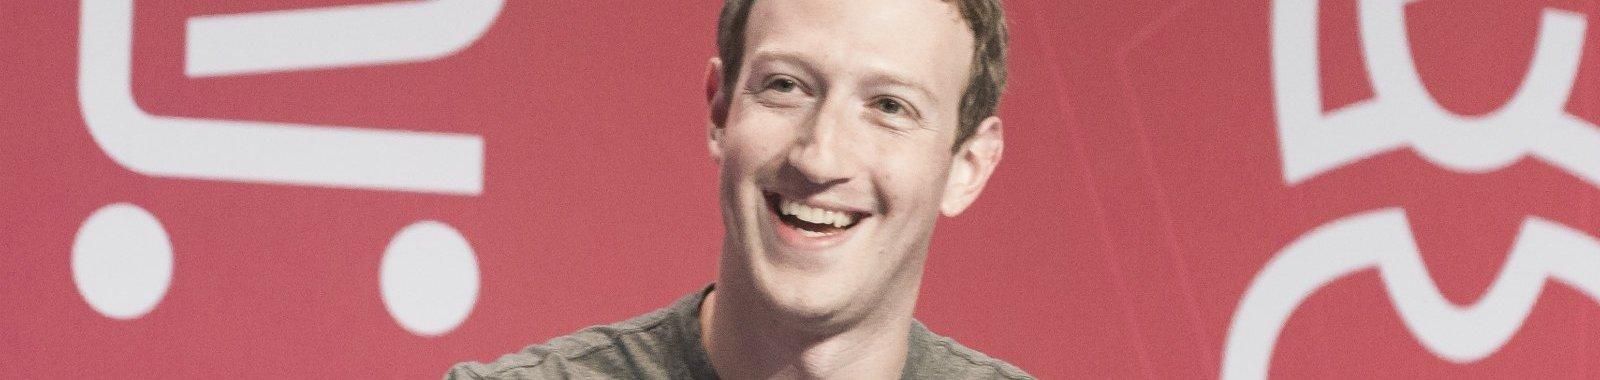 Zuckerberg-Shutterstock-Featured